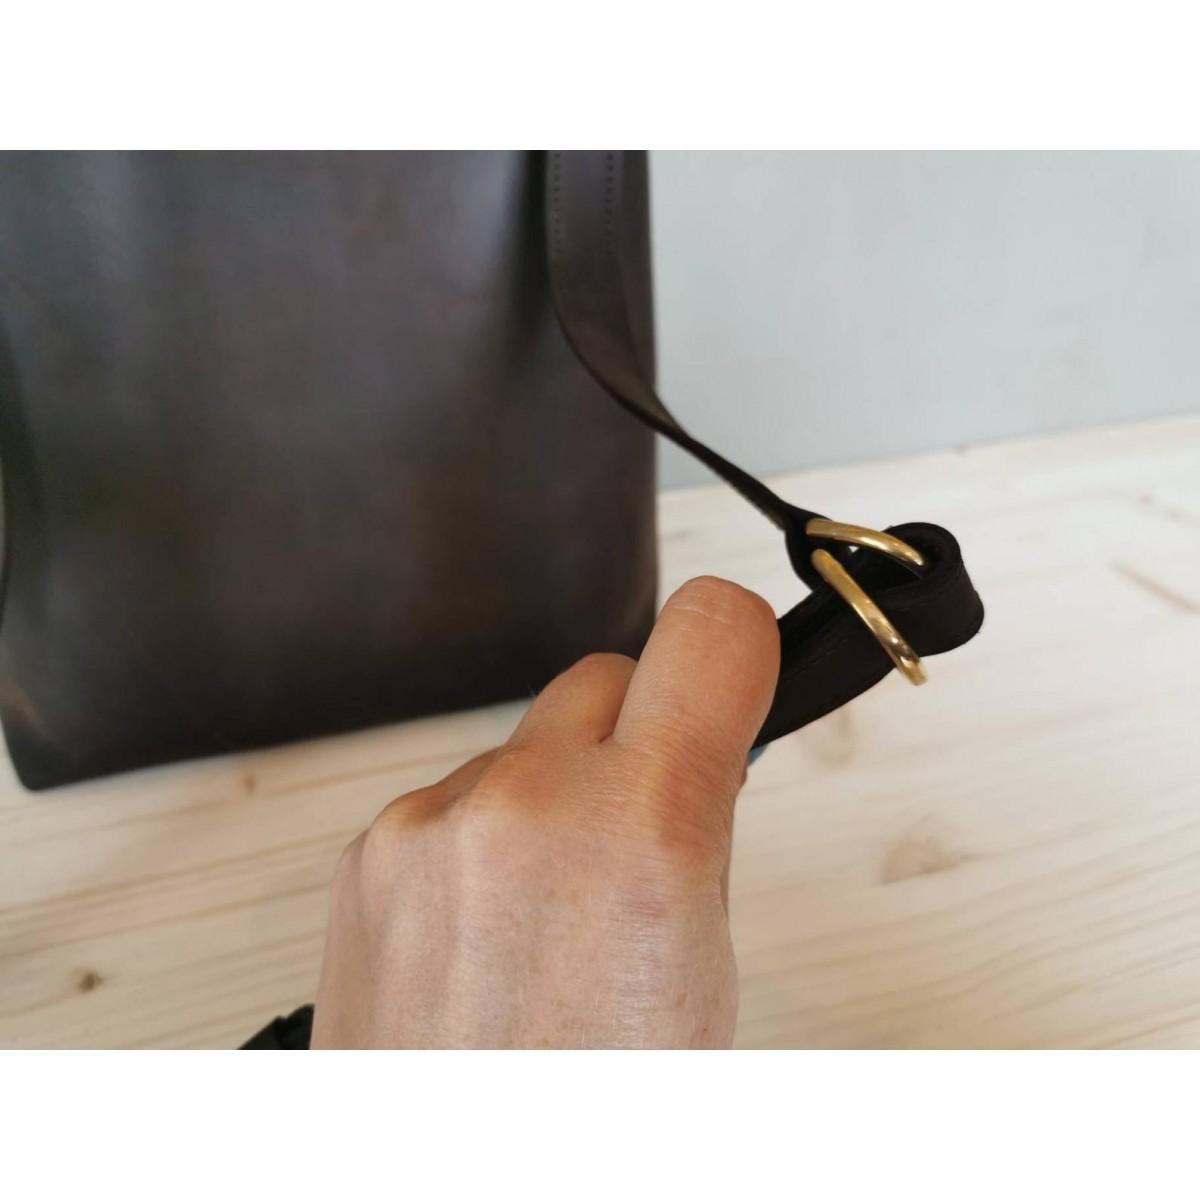 Leder Bucket Bag // Leder Beuteltasche // Bucketbag aus dunkelbraunem Leder // chestnut Umhängetasche // boho